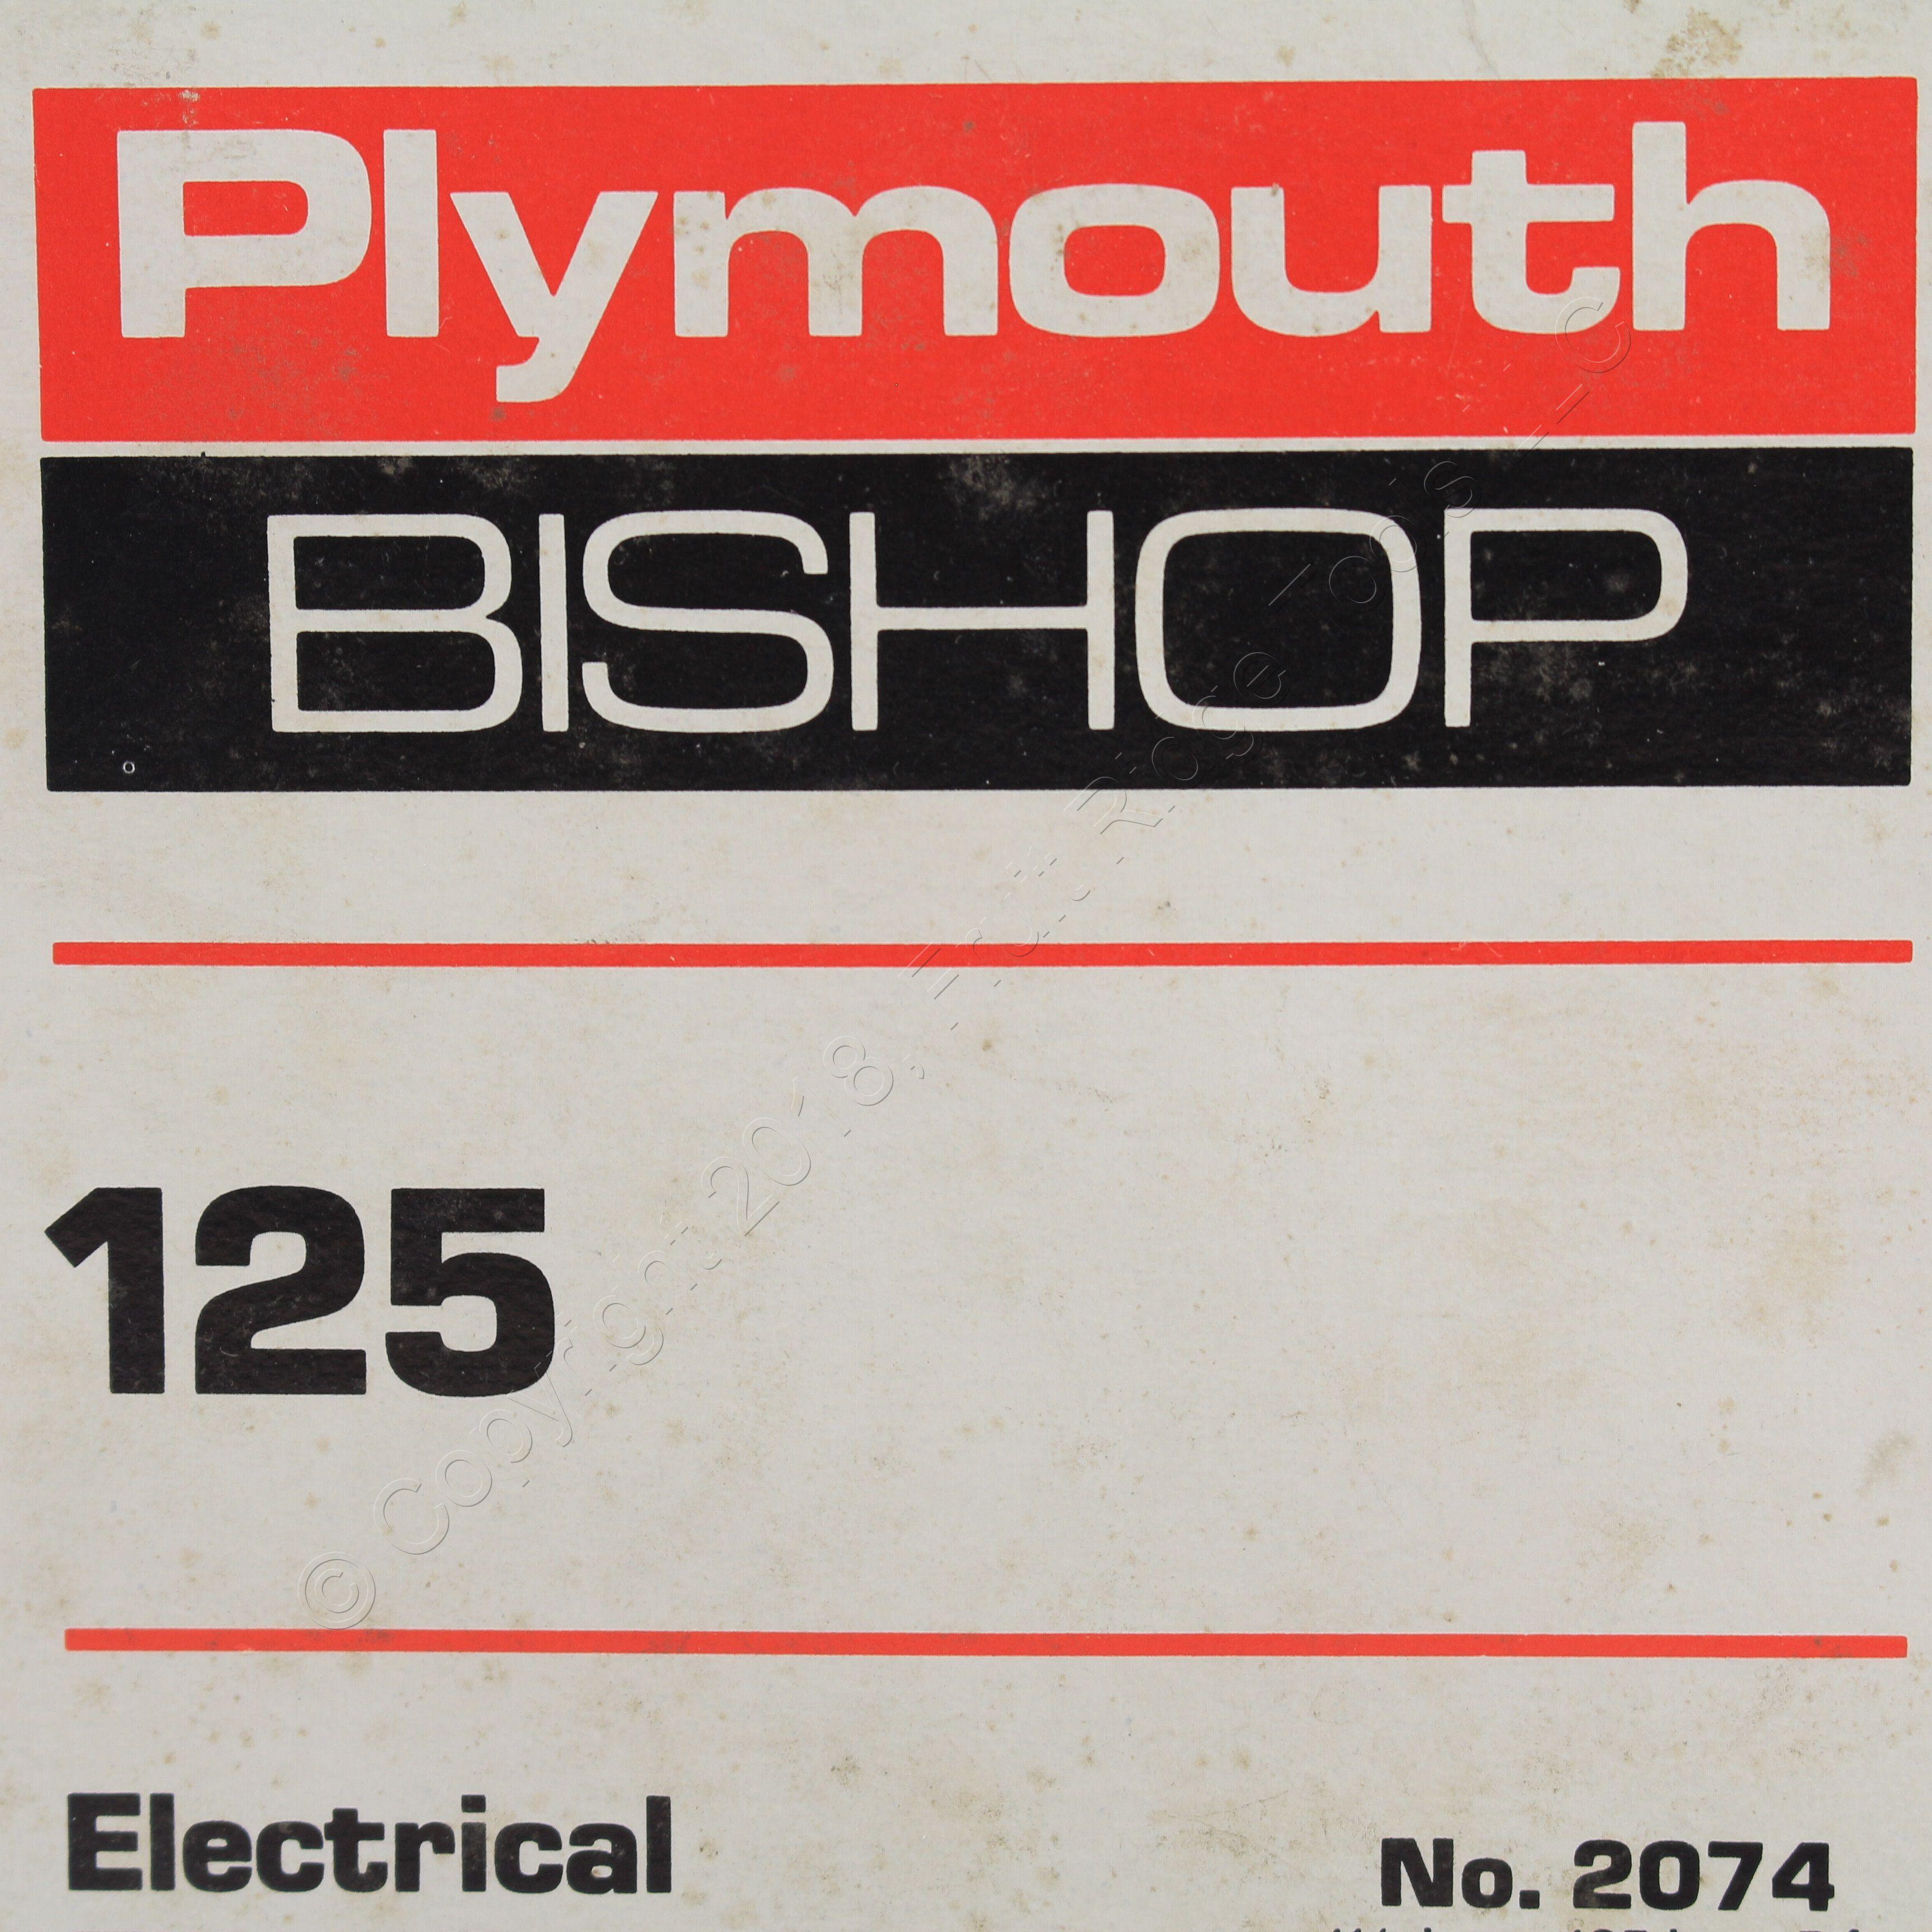 "Plymouth Bishop 125 No 2074 Electrical Filler Tape 1 1//2/"" x ..125/"" x 5/'free ship"